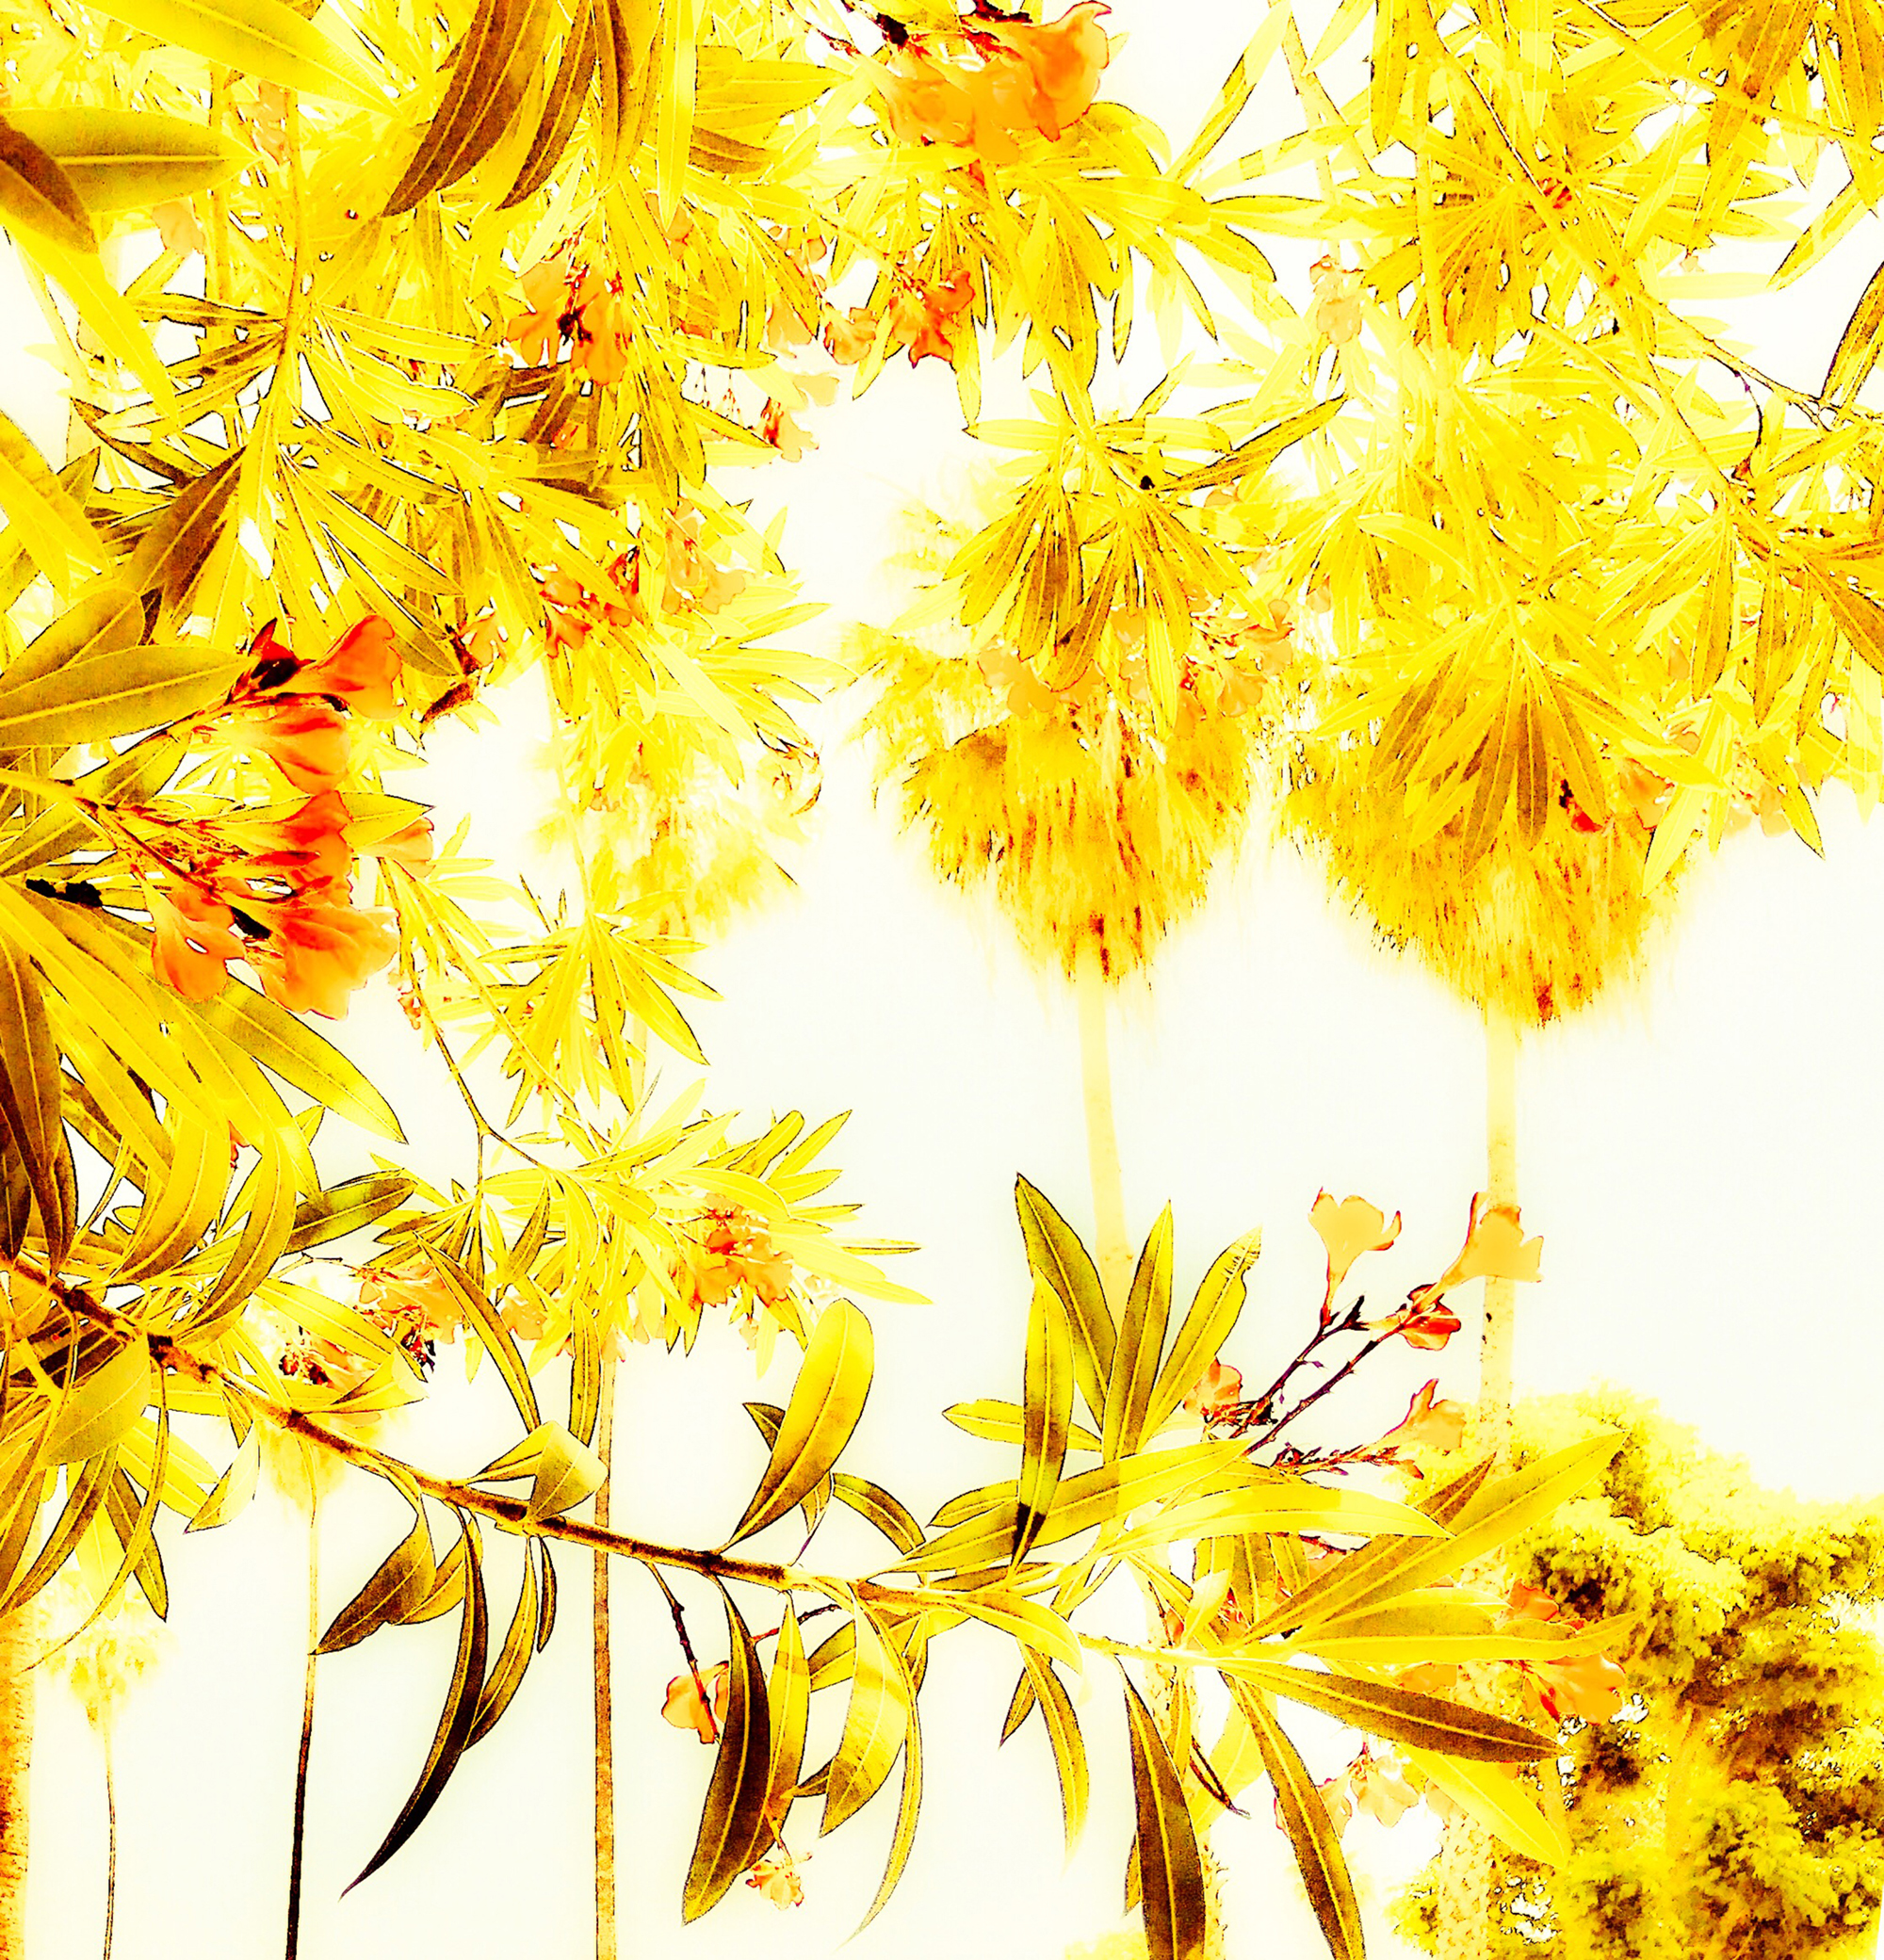 goldtrees-IMG_7911-sq.jpg